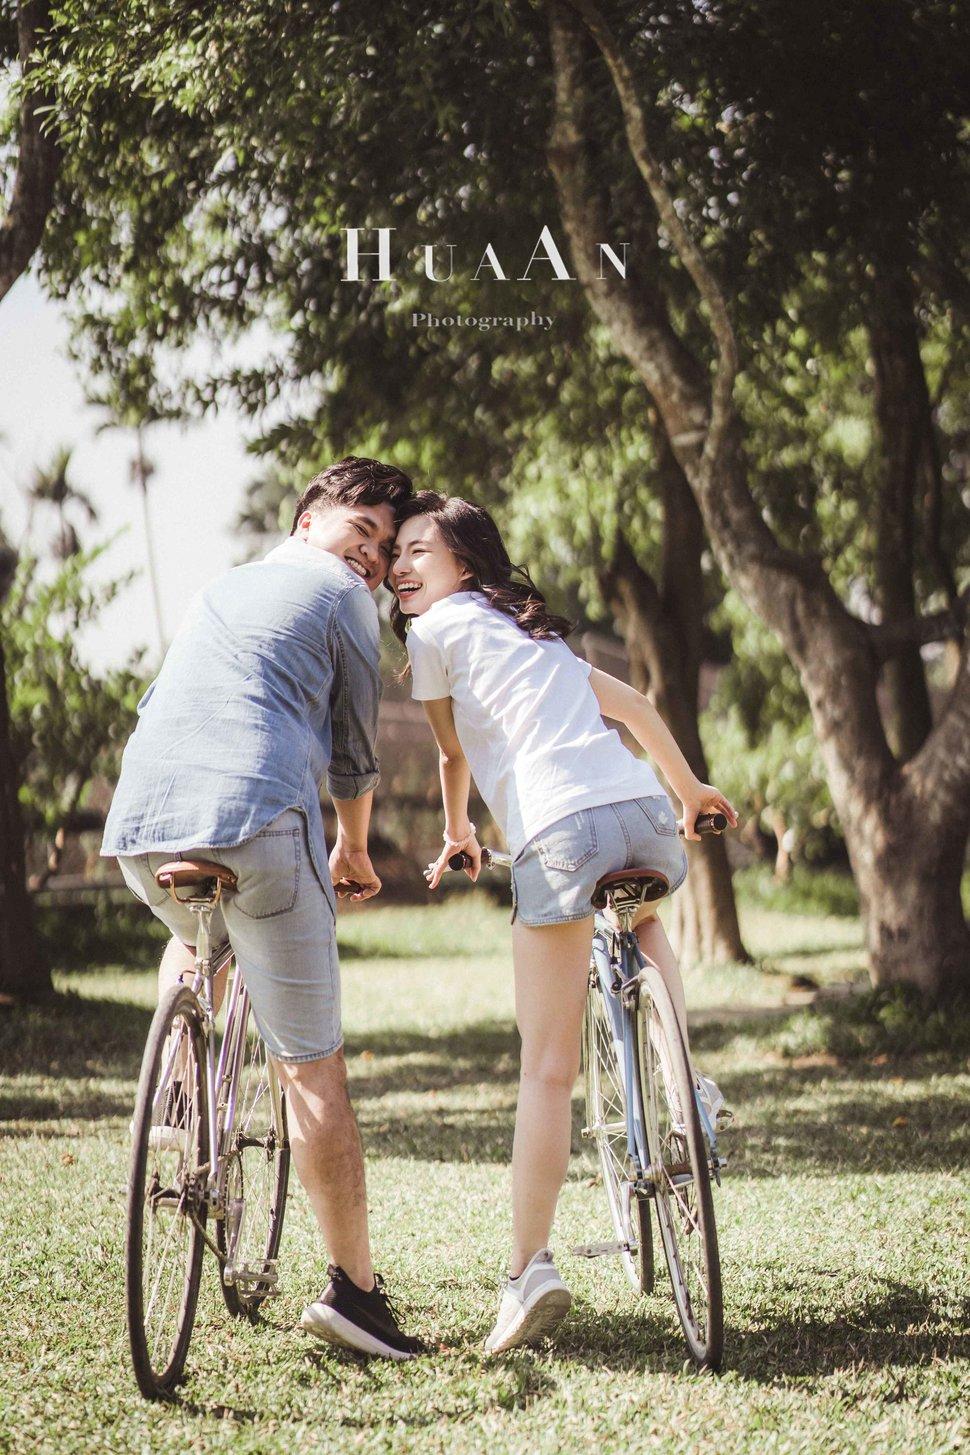 DSC04095 - Huaan Photography《結婚吧》